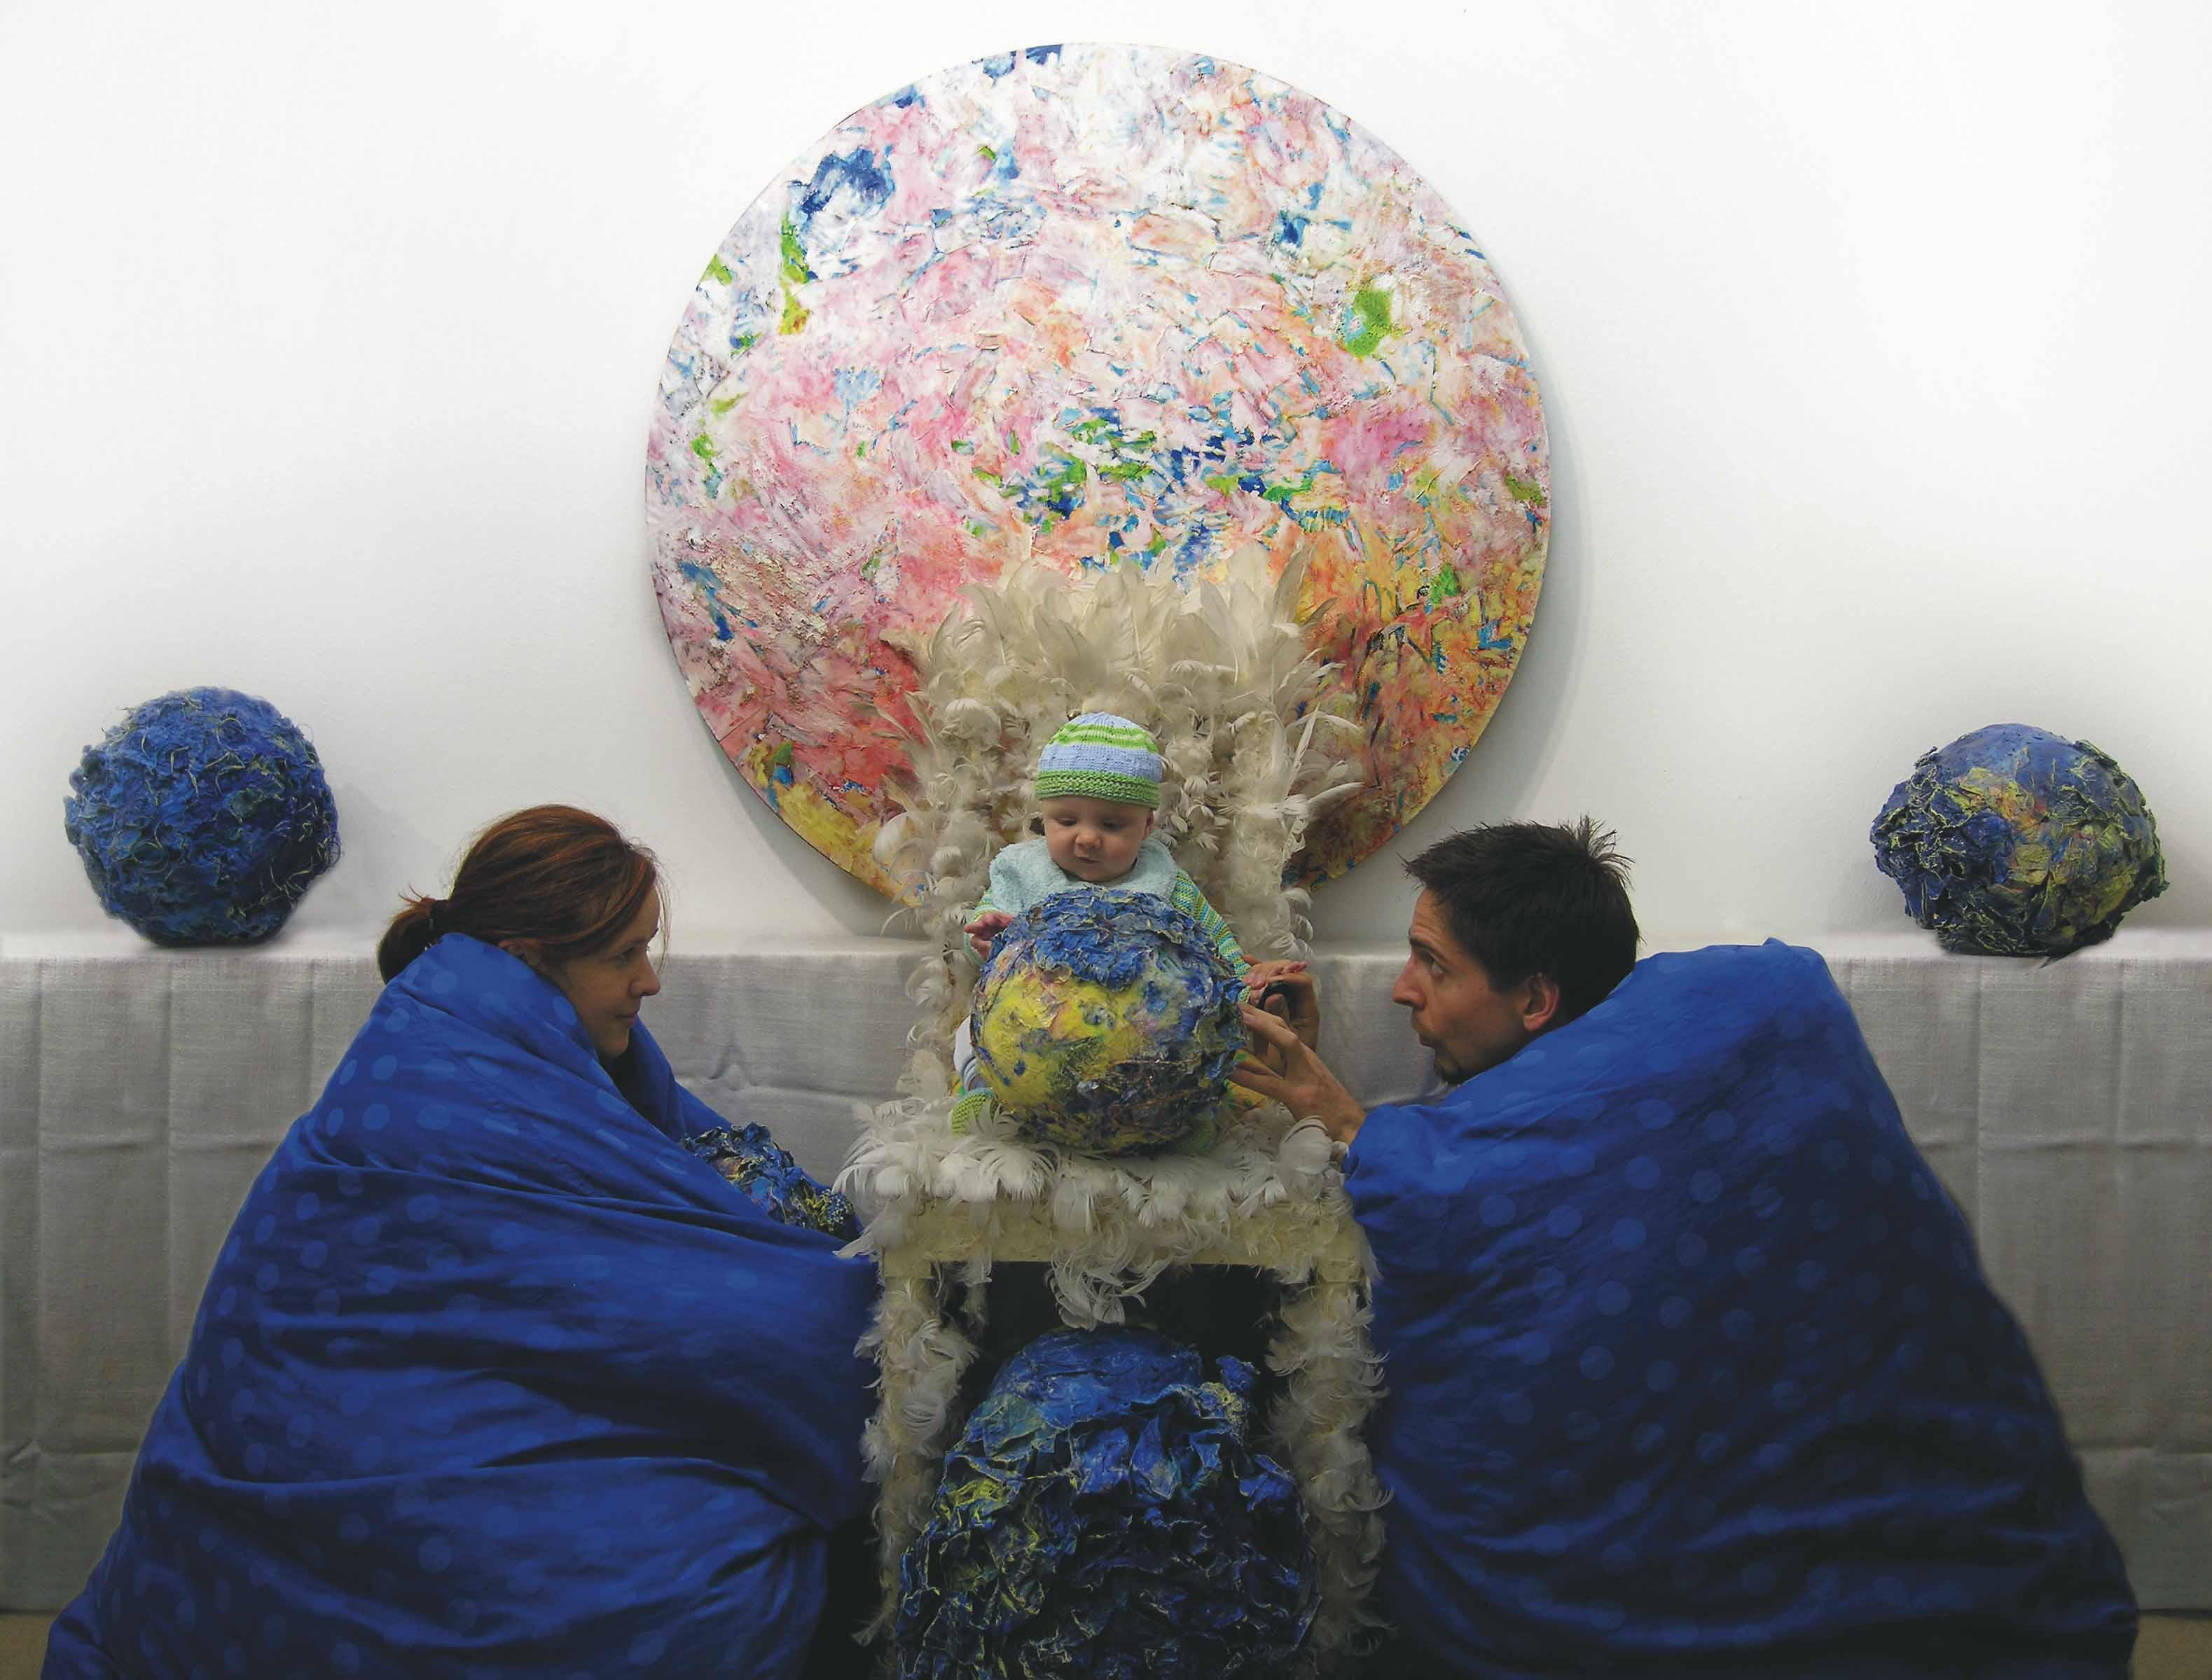 Lea Lenhart/Andrej Henze/Kunstakademie Düsseldorf/Fotografie